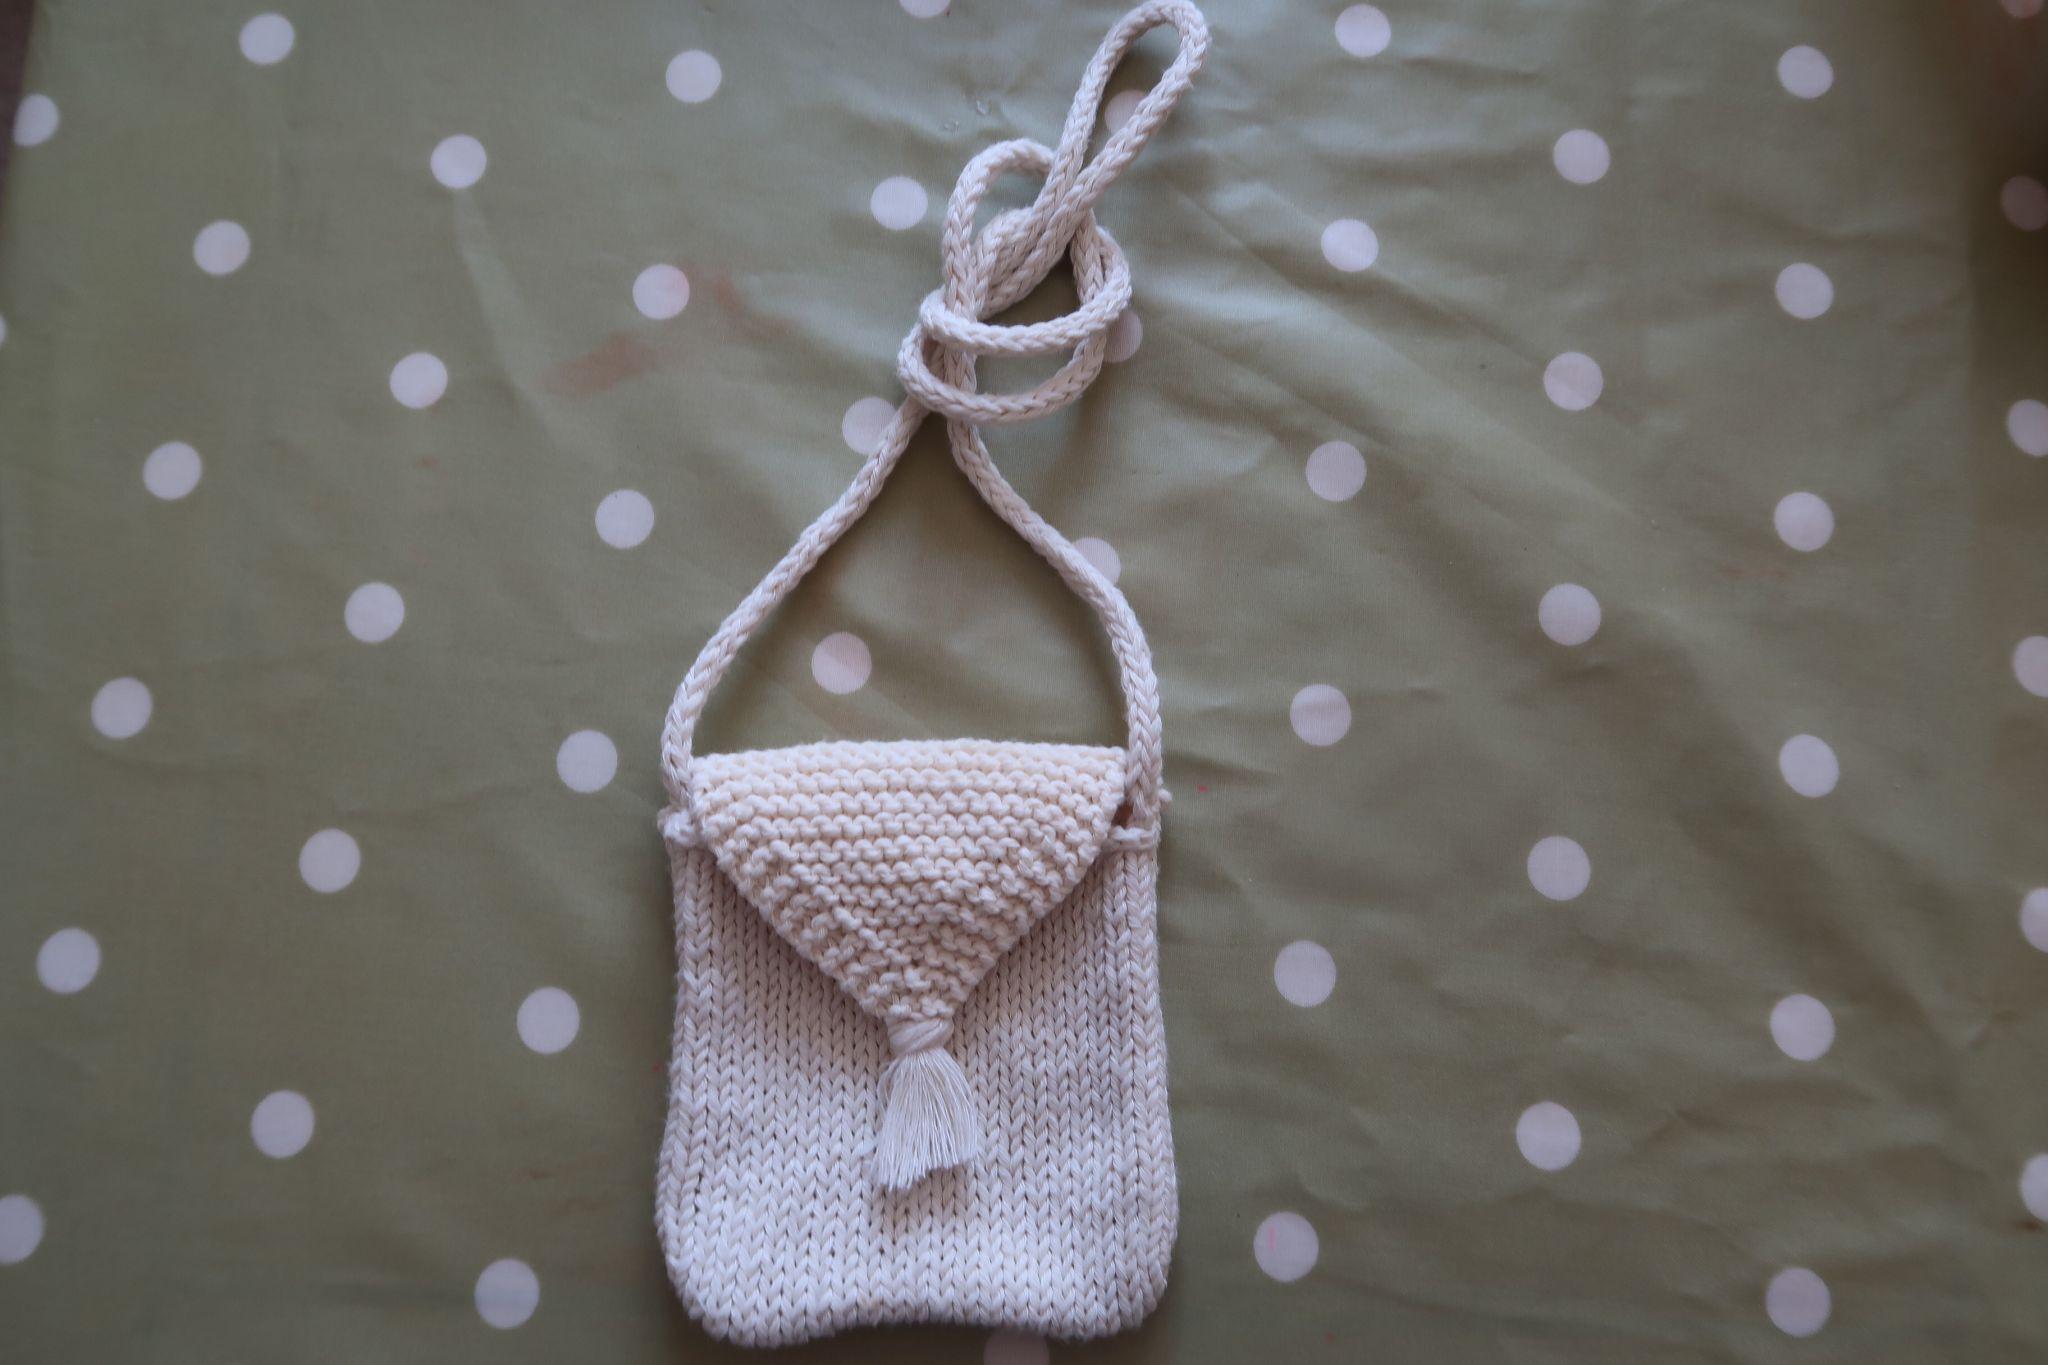 A child's woollen bag